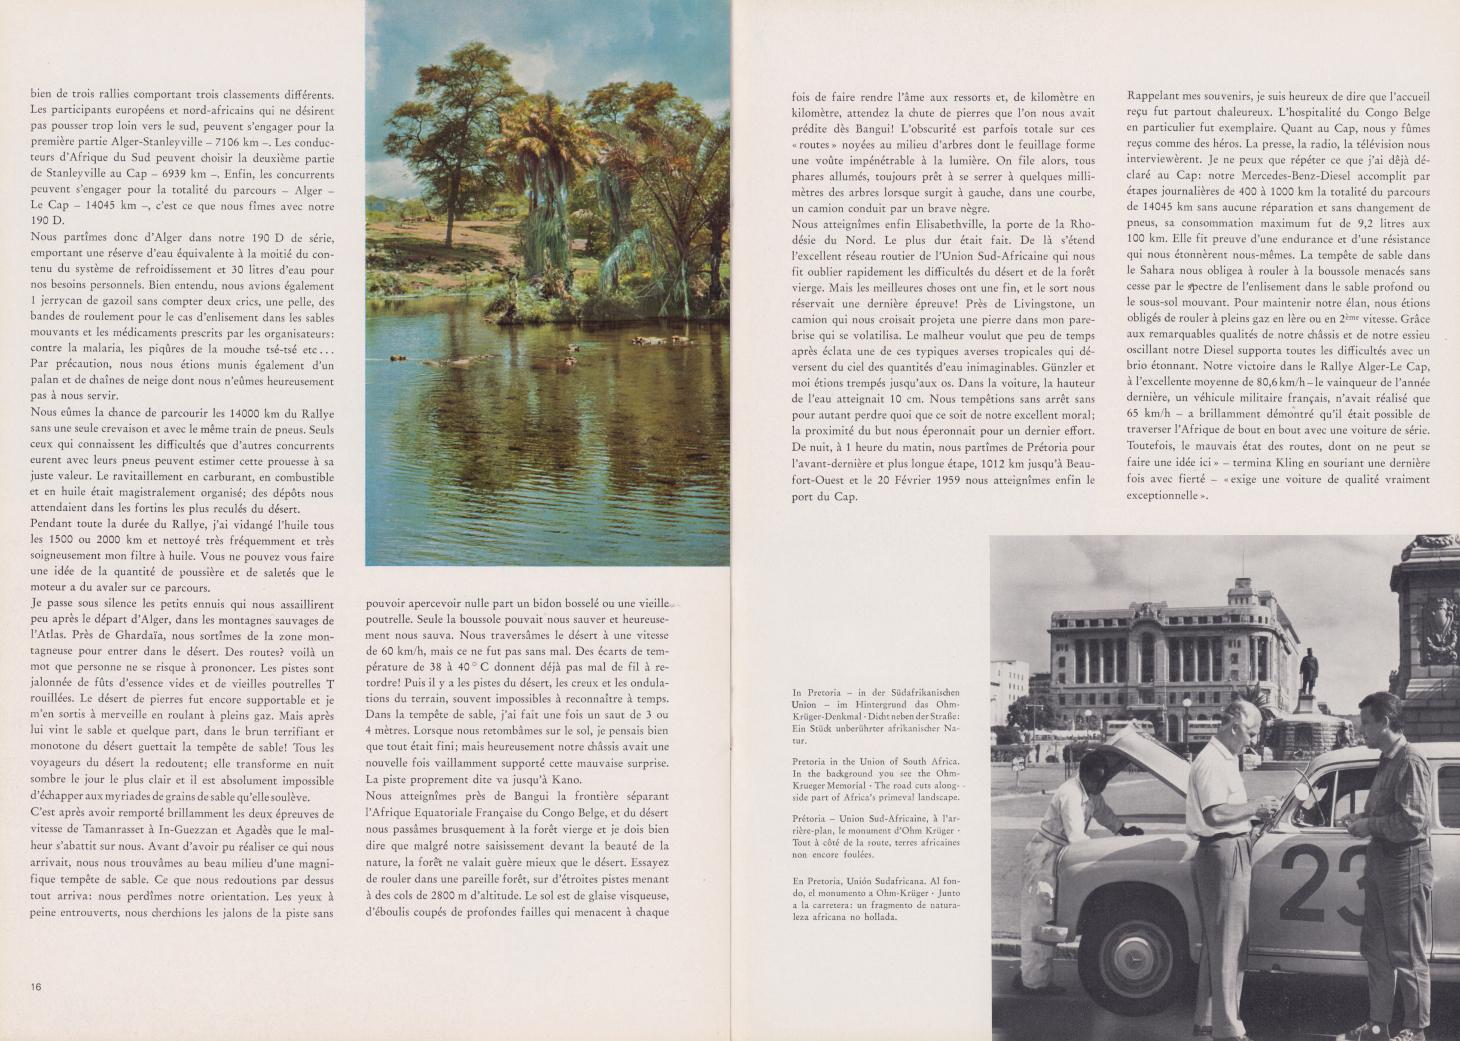 (REVISTA): Periódico In aller welt n.º 31 - Mercedes-Benz no mundo - 1959 - multilingue 009